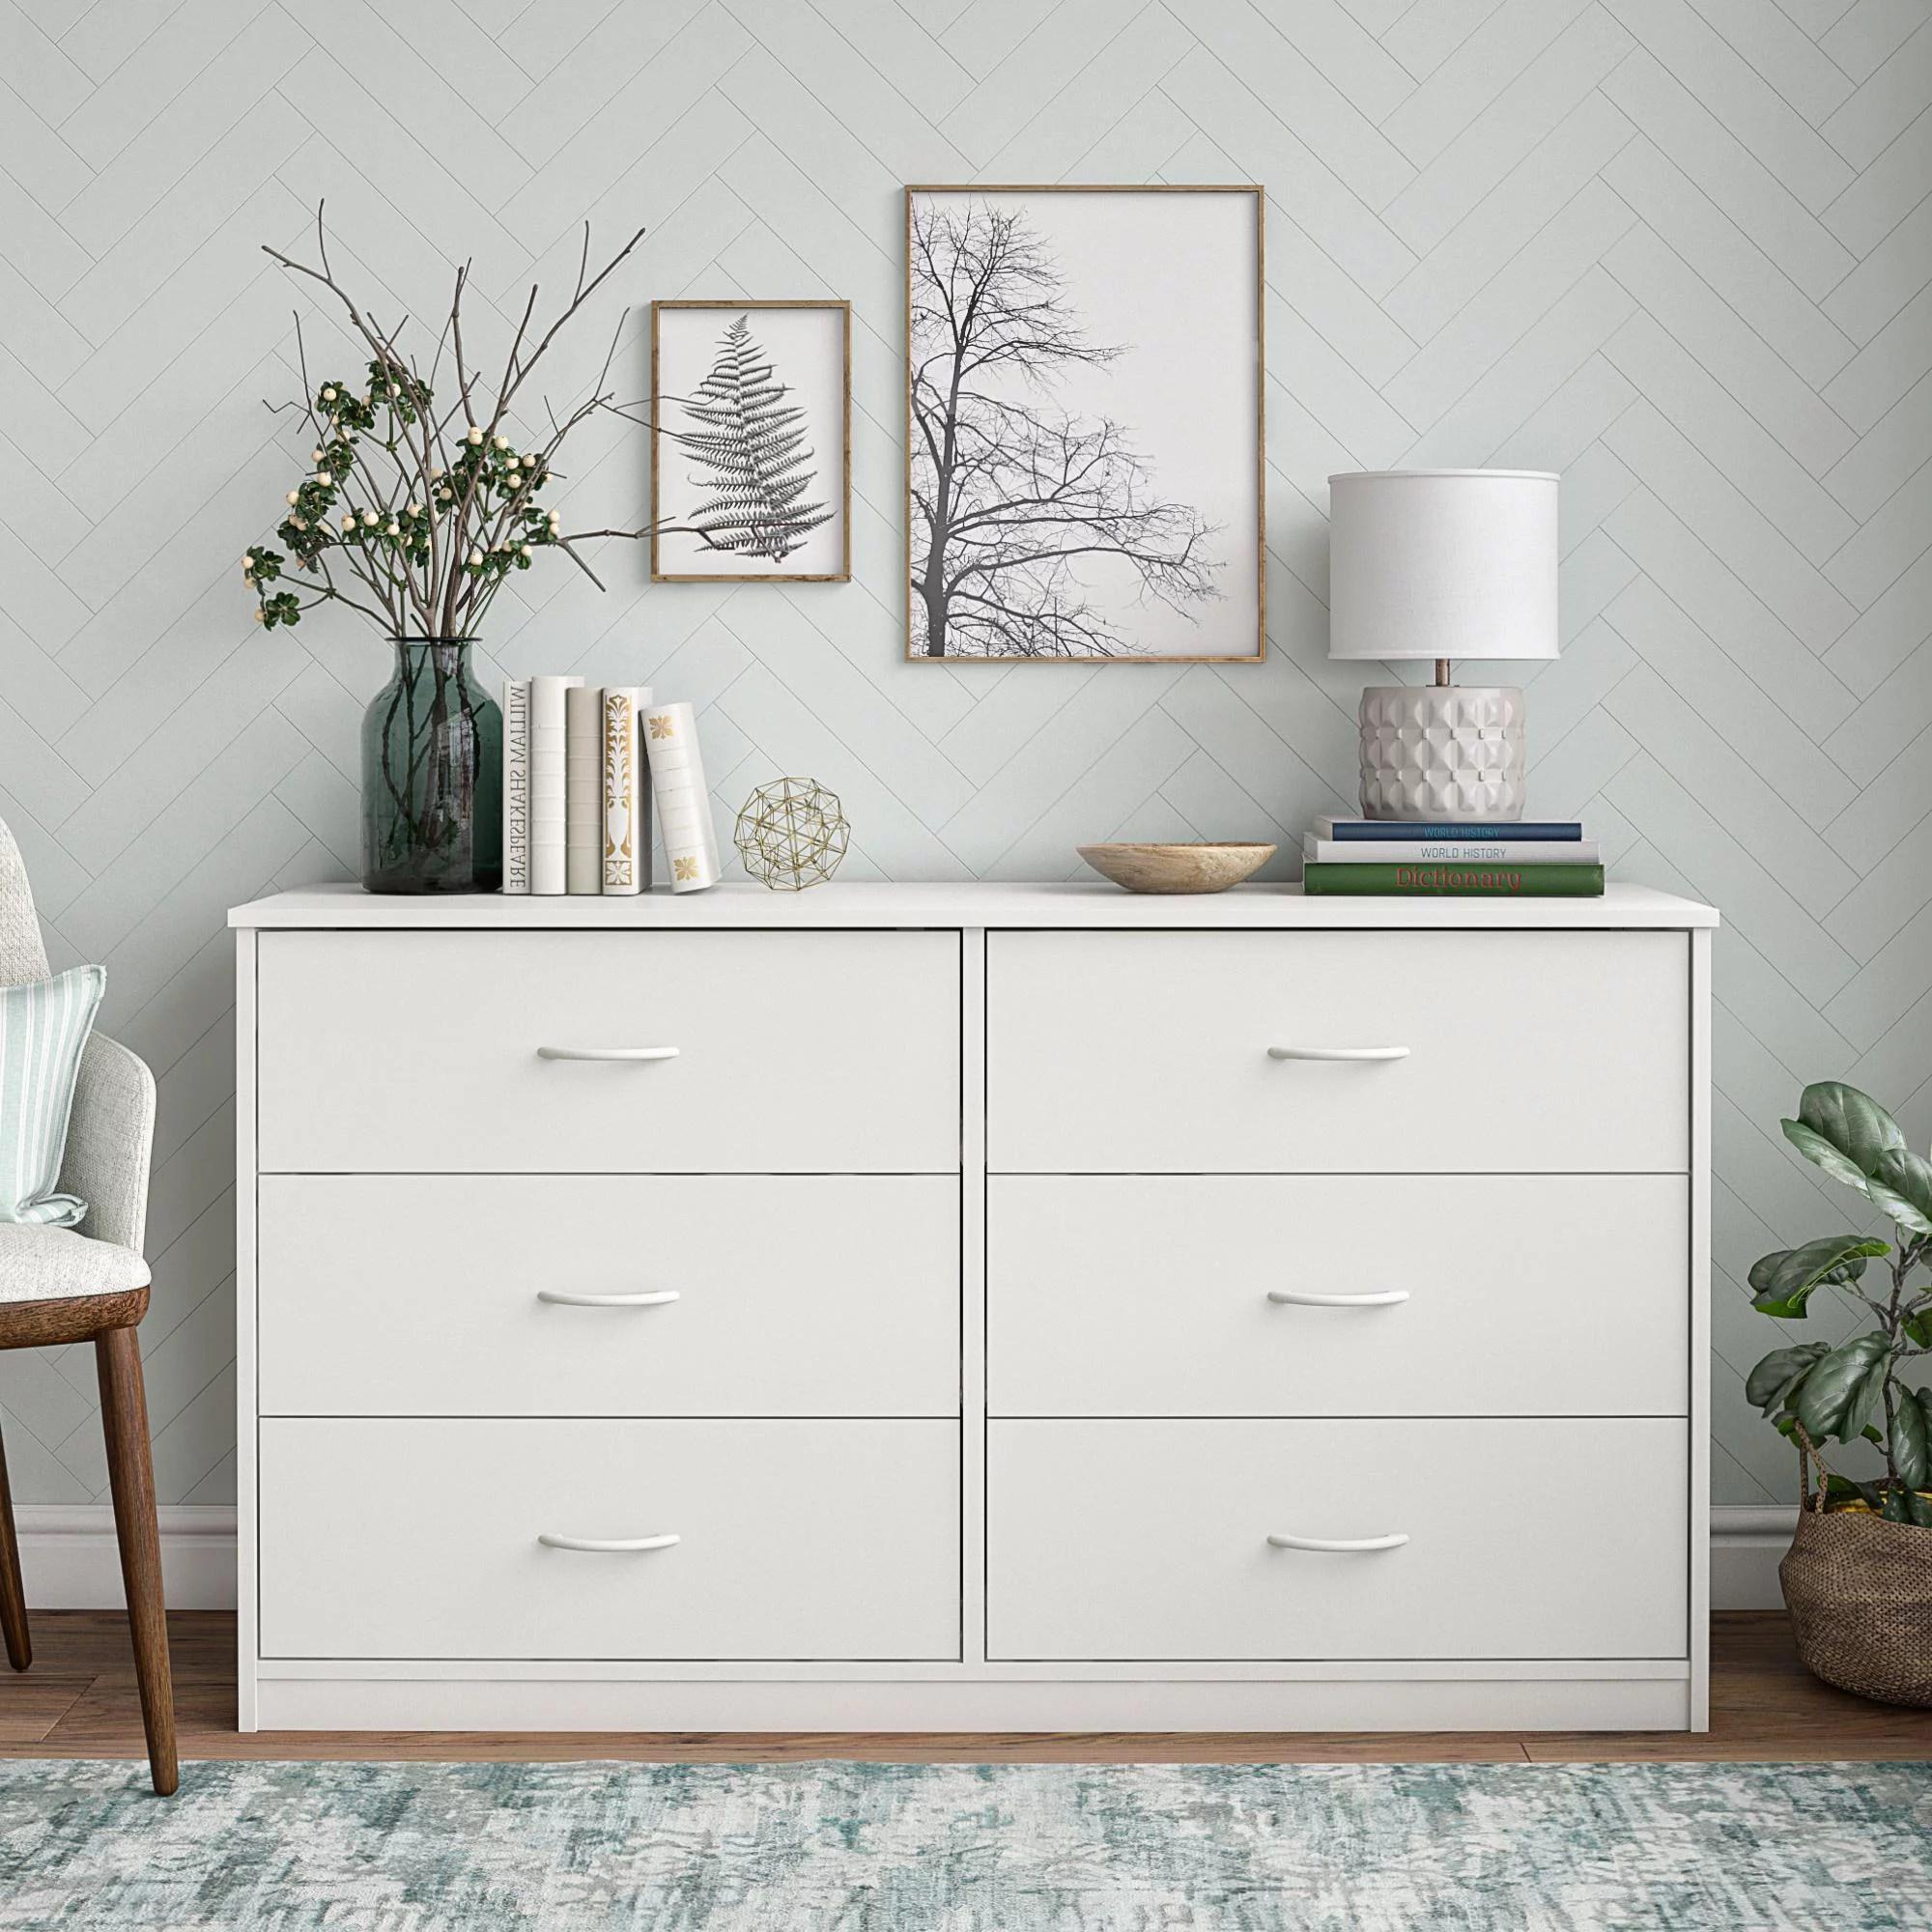 mainstays classic 6 drawer dresser white finish